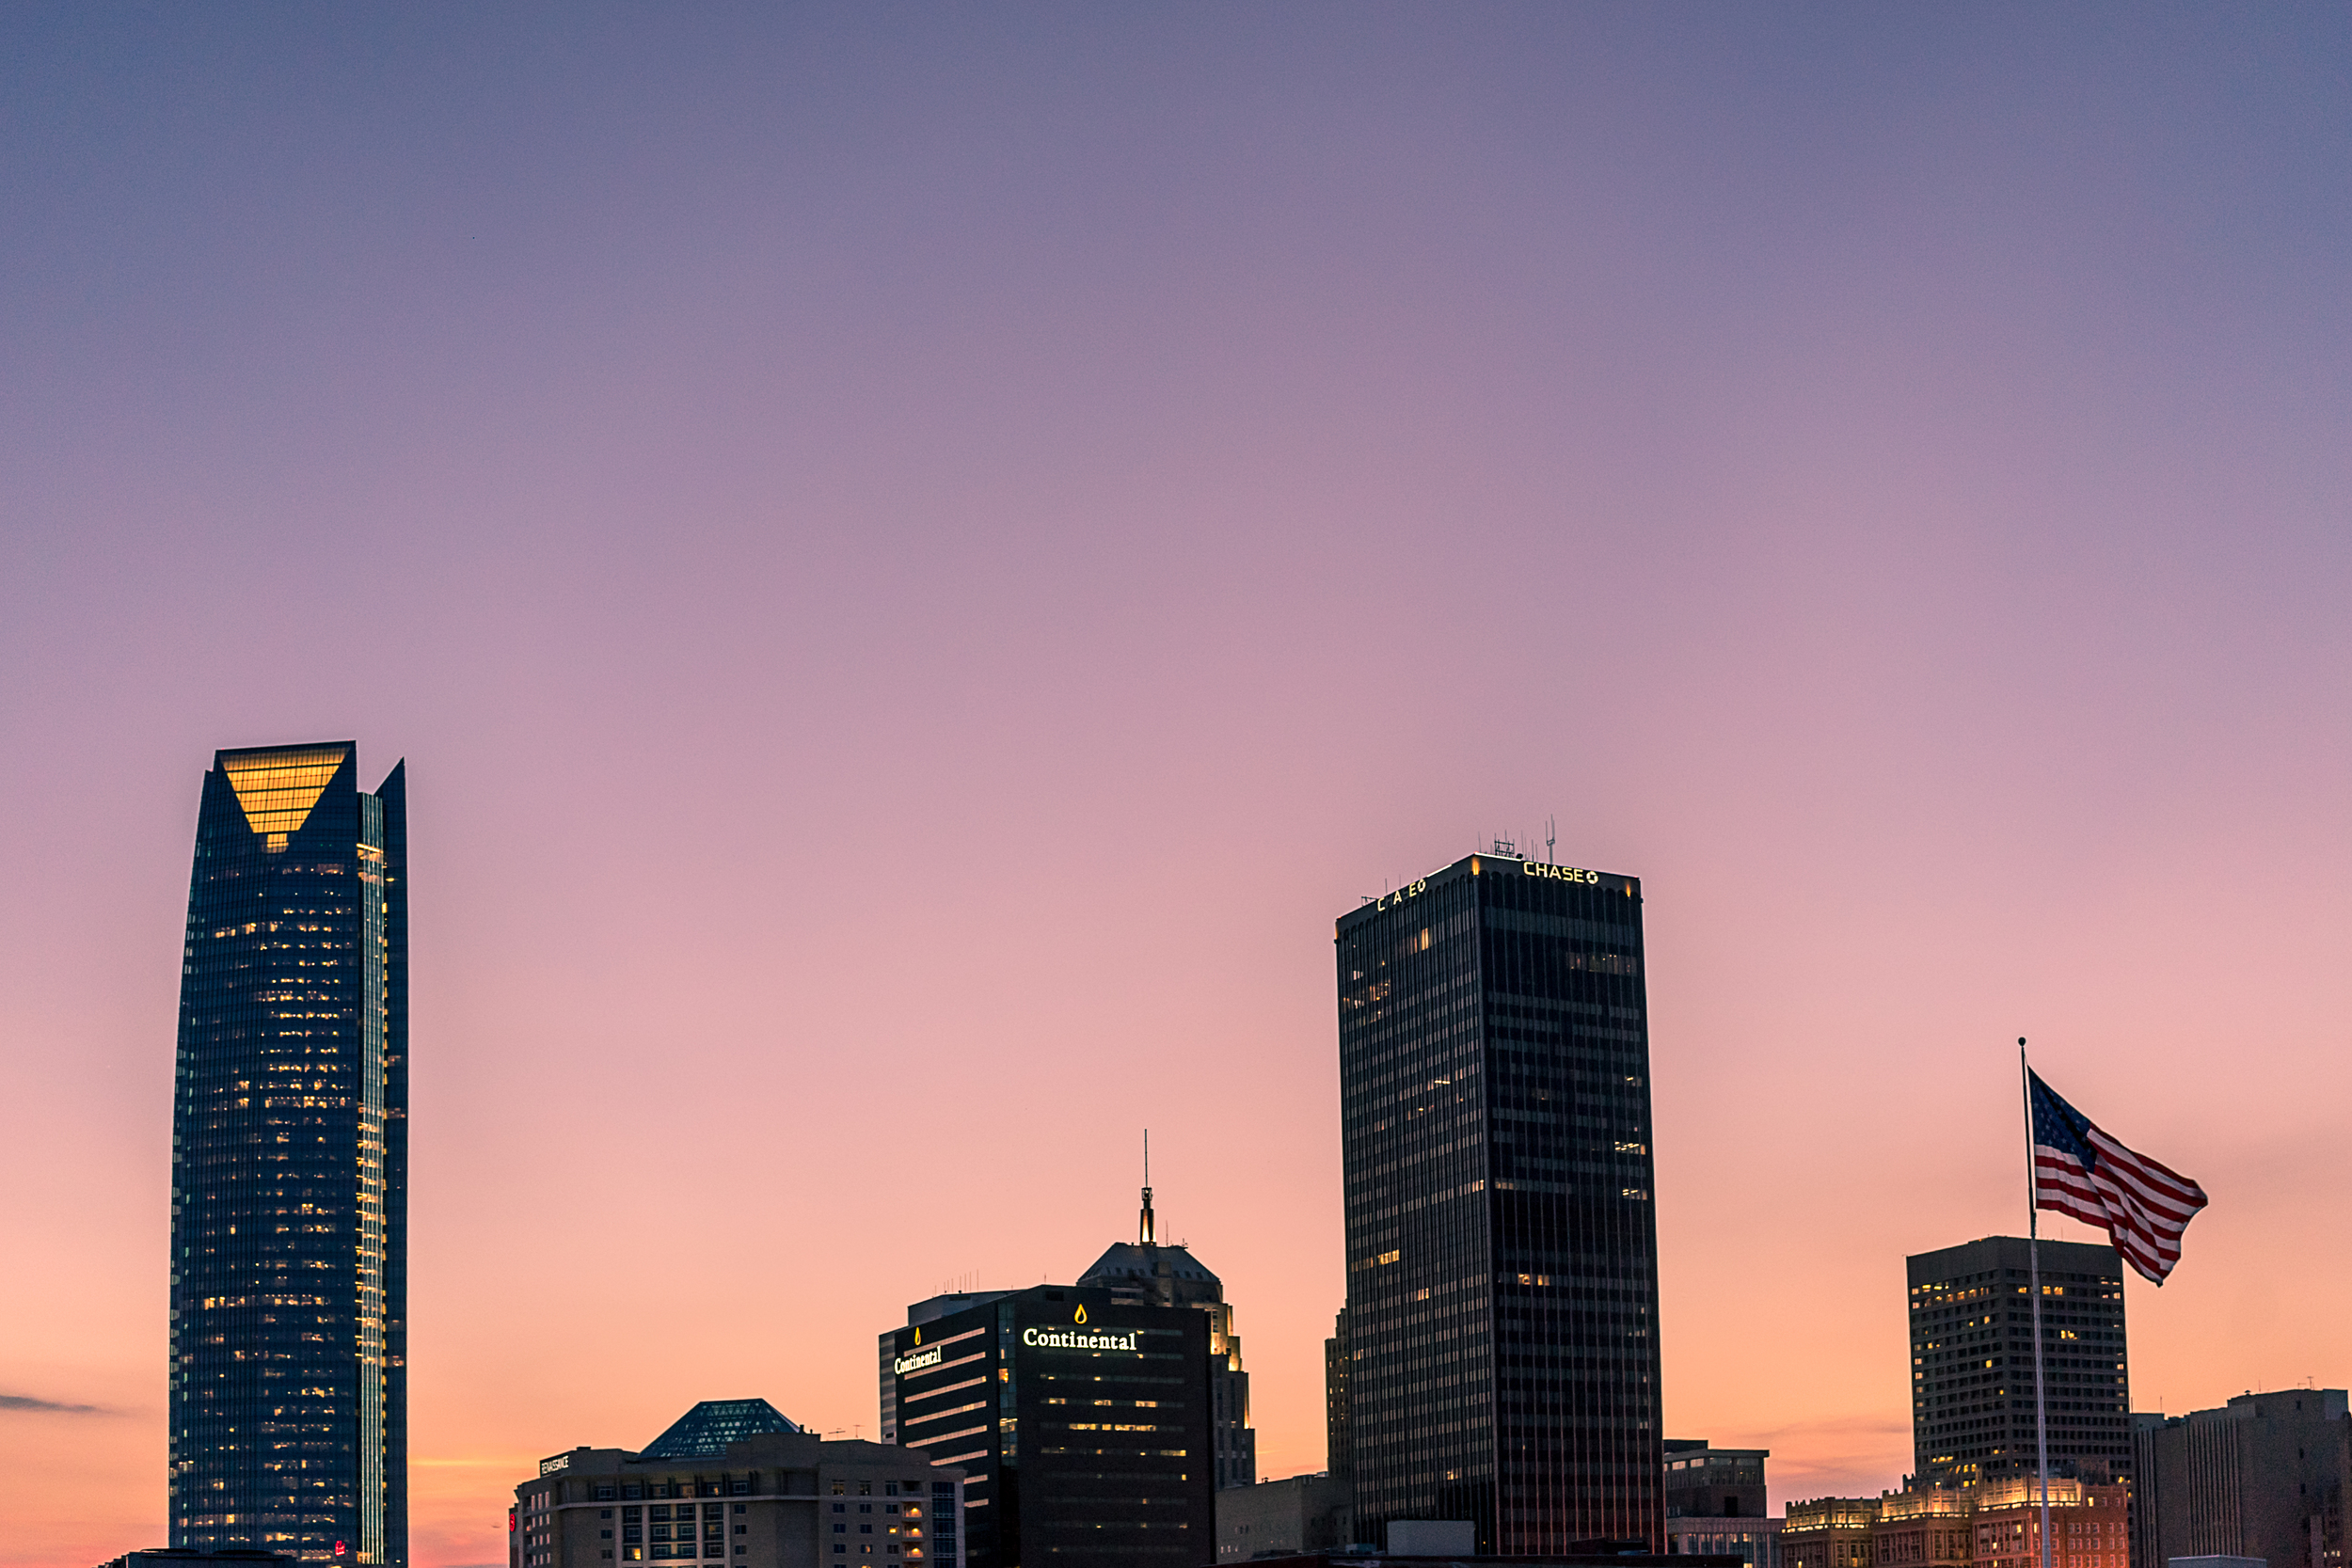 Oklahoma city at dusk - Devon Energy building